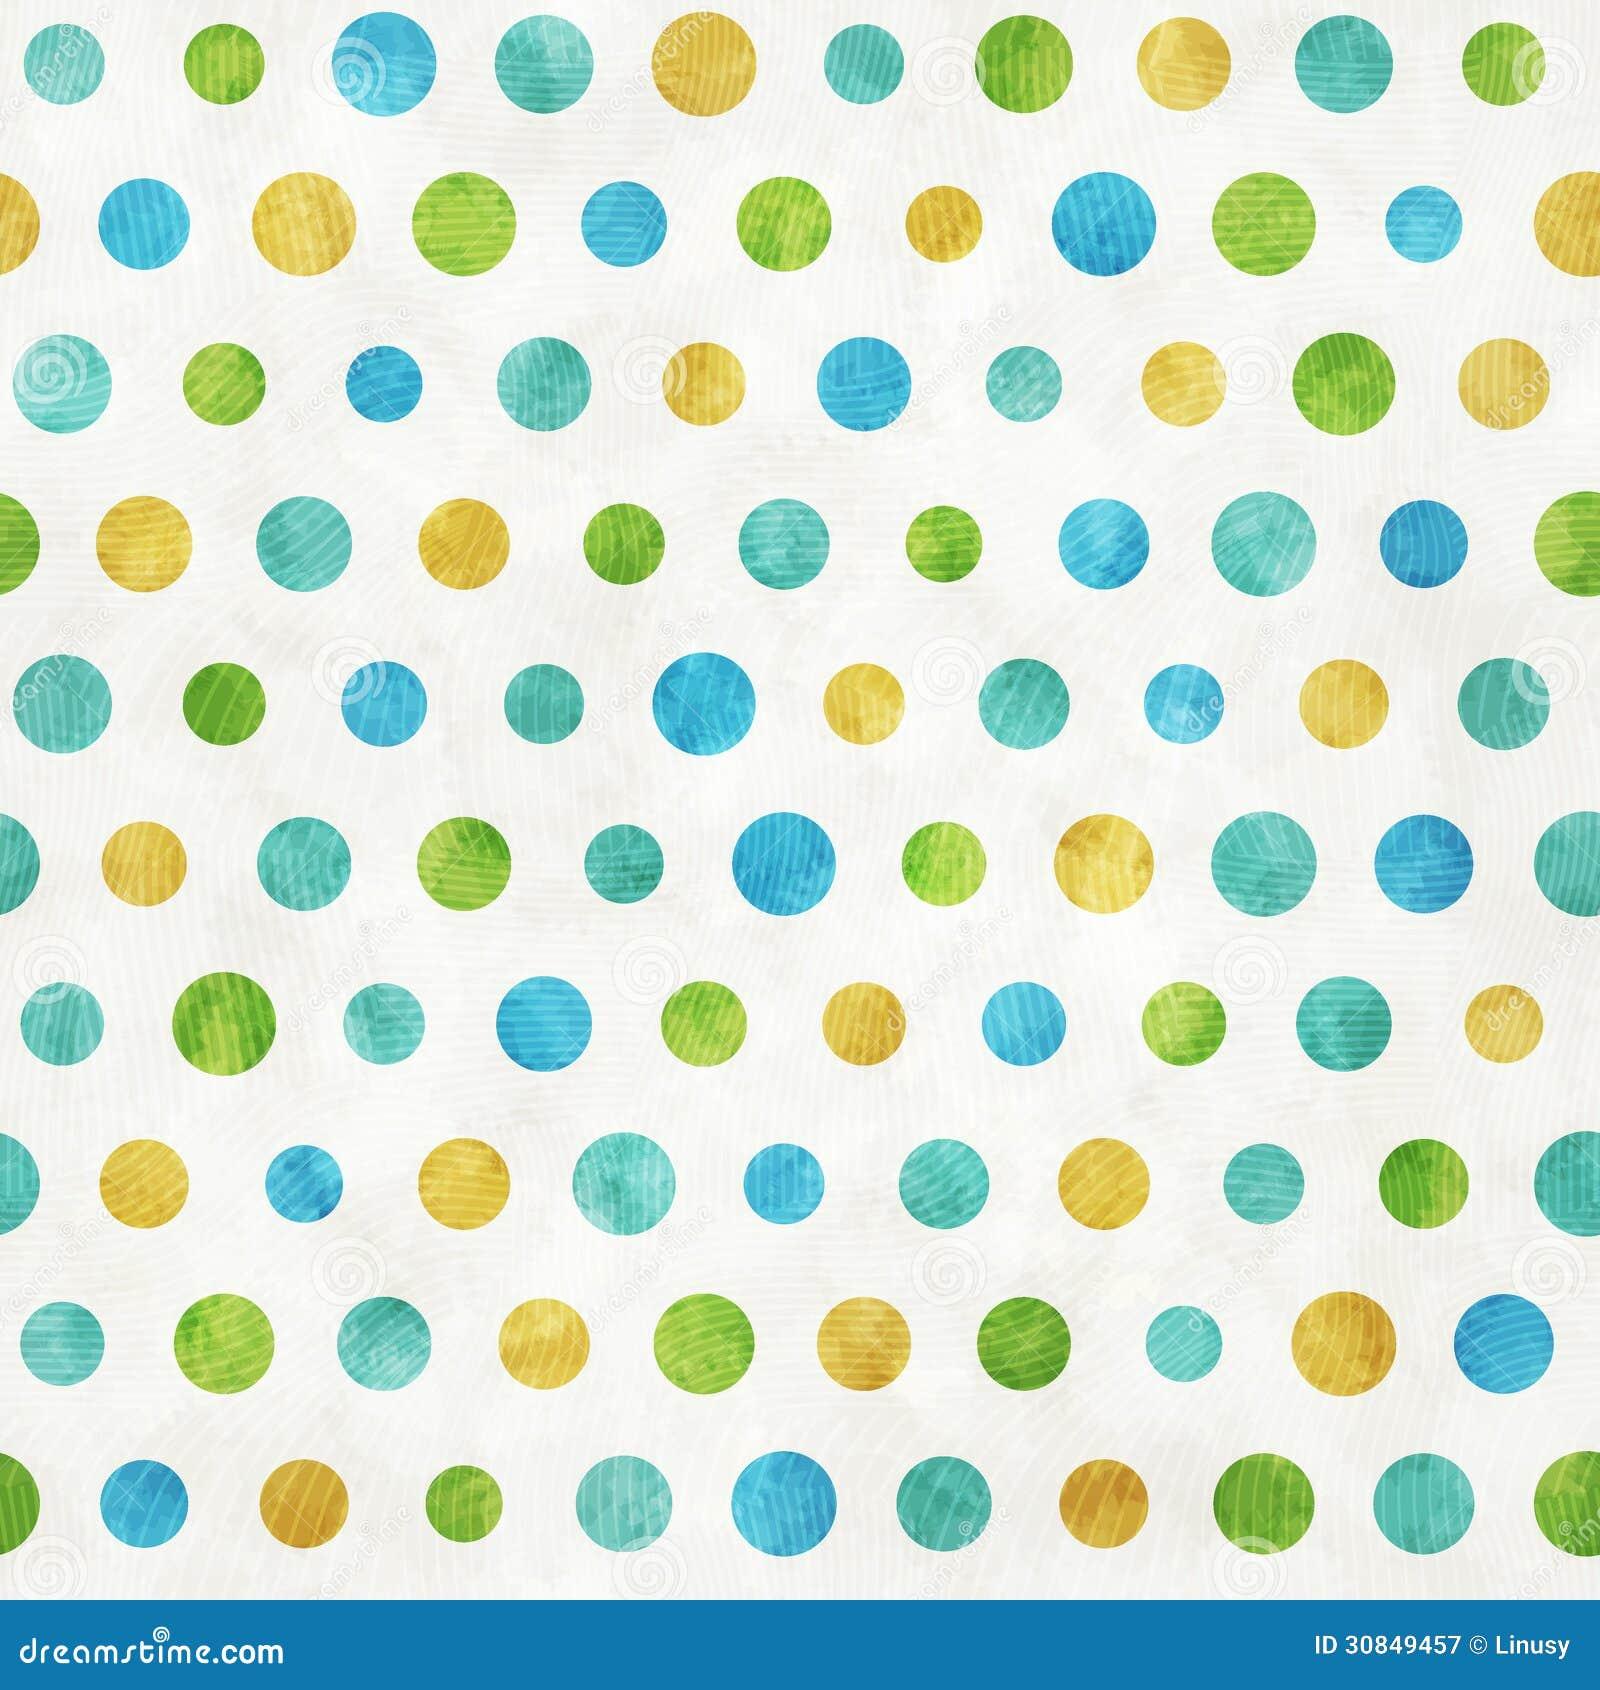 watercolor dots royalty free stock photography image 30849457